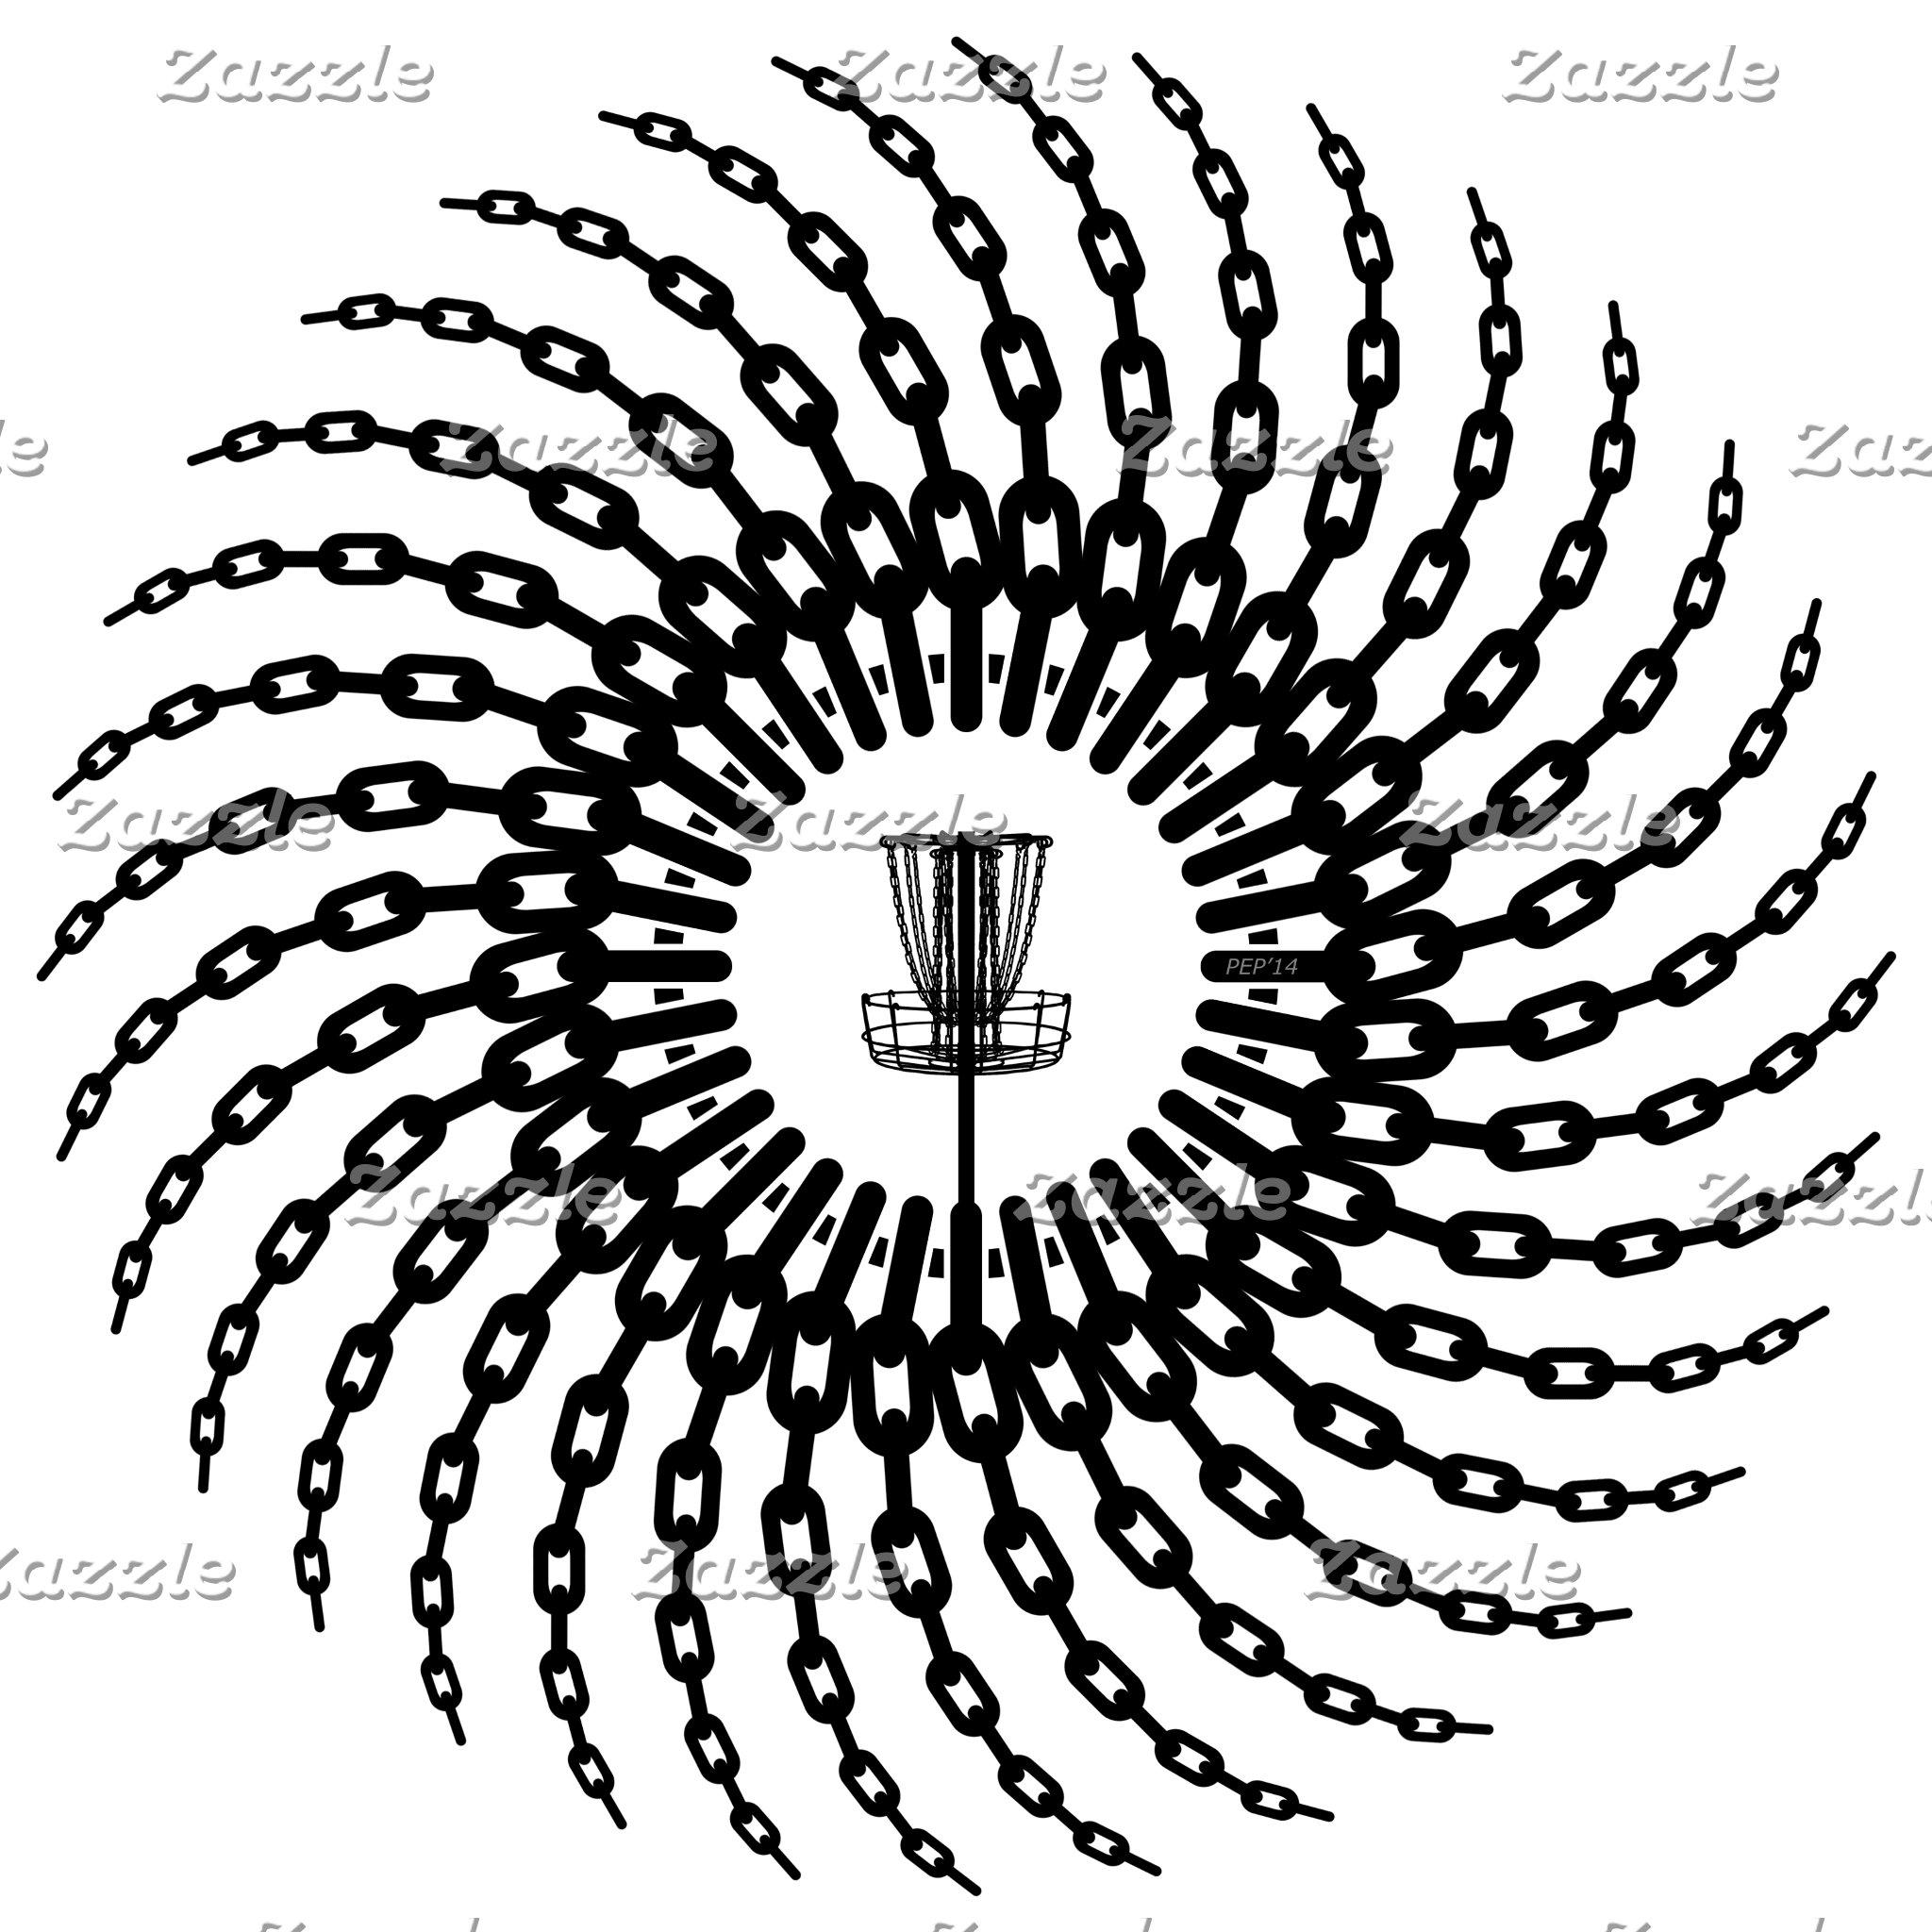 Disc Golf Basket Chains